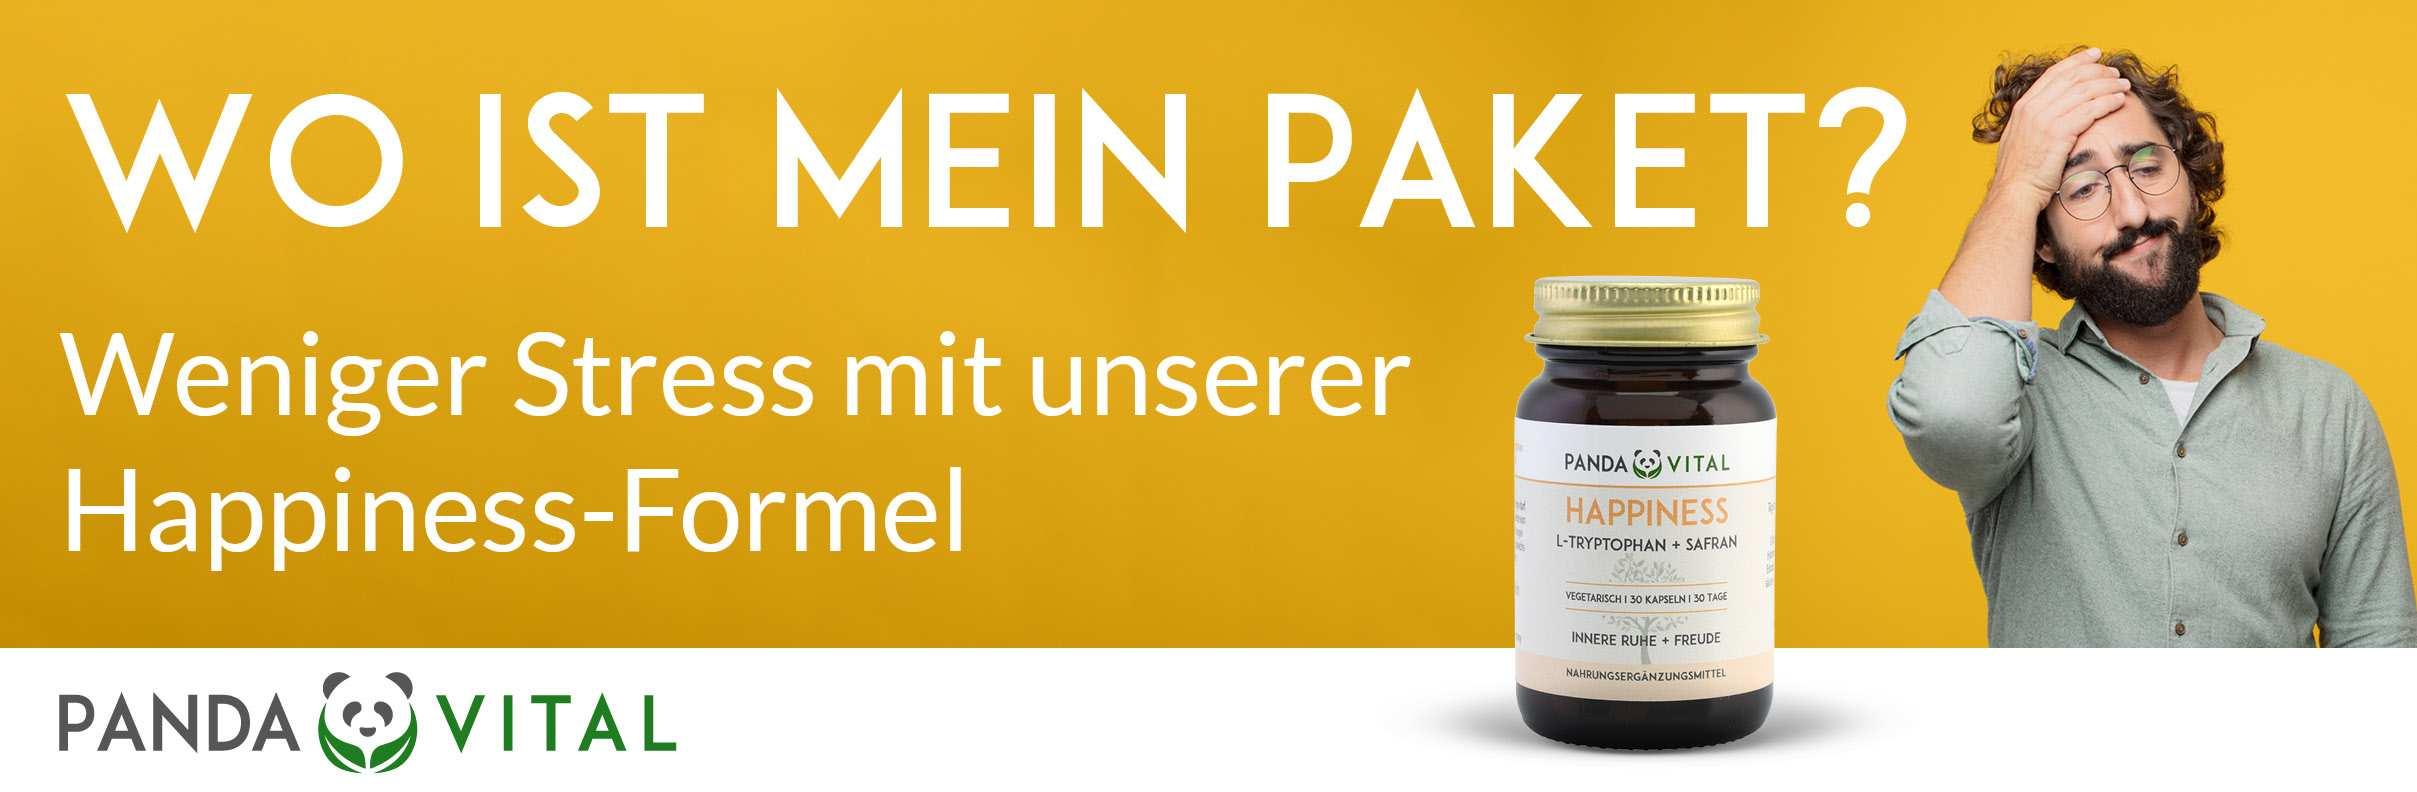 Abstellgenehmigung Dpd Hermes Dhl Ups Gls Amazon Co Paksafe